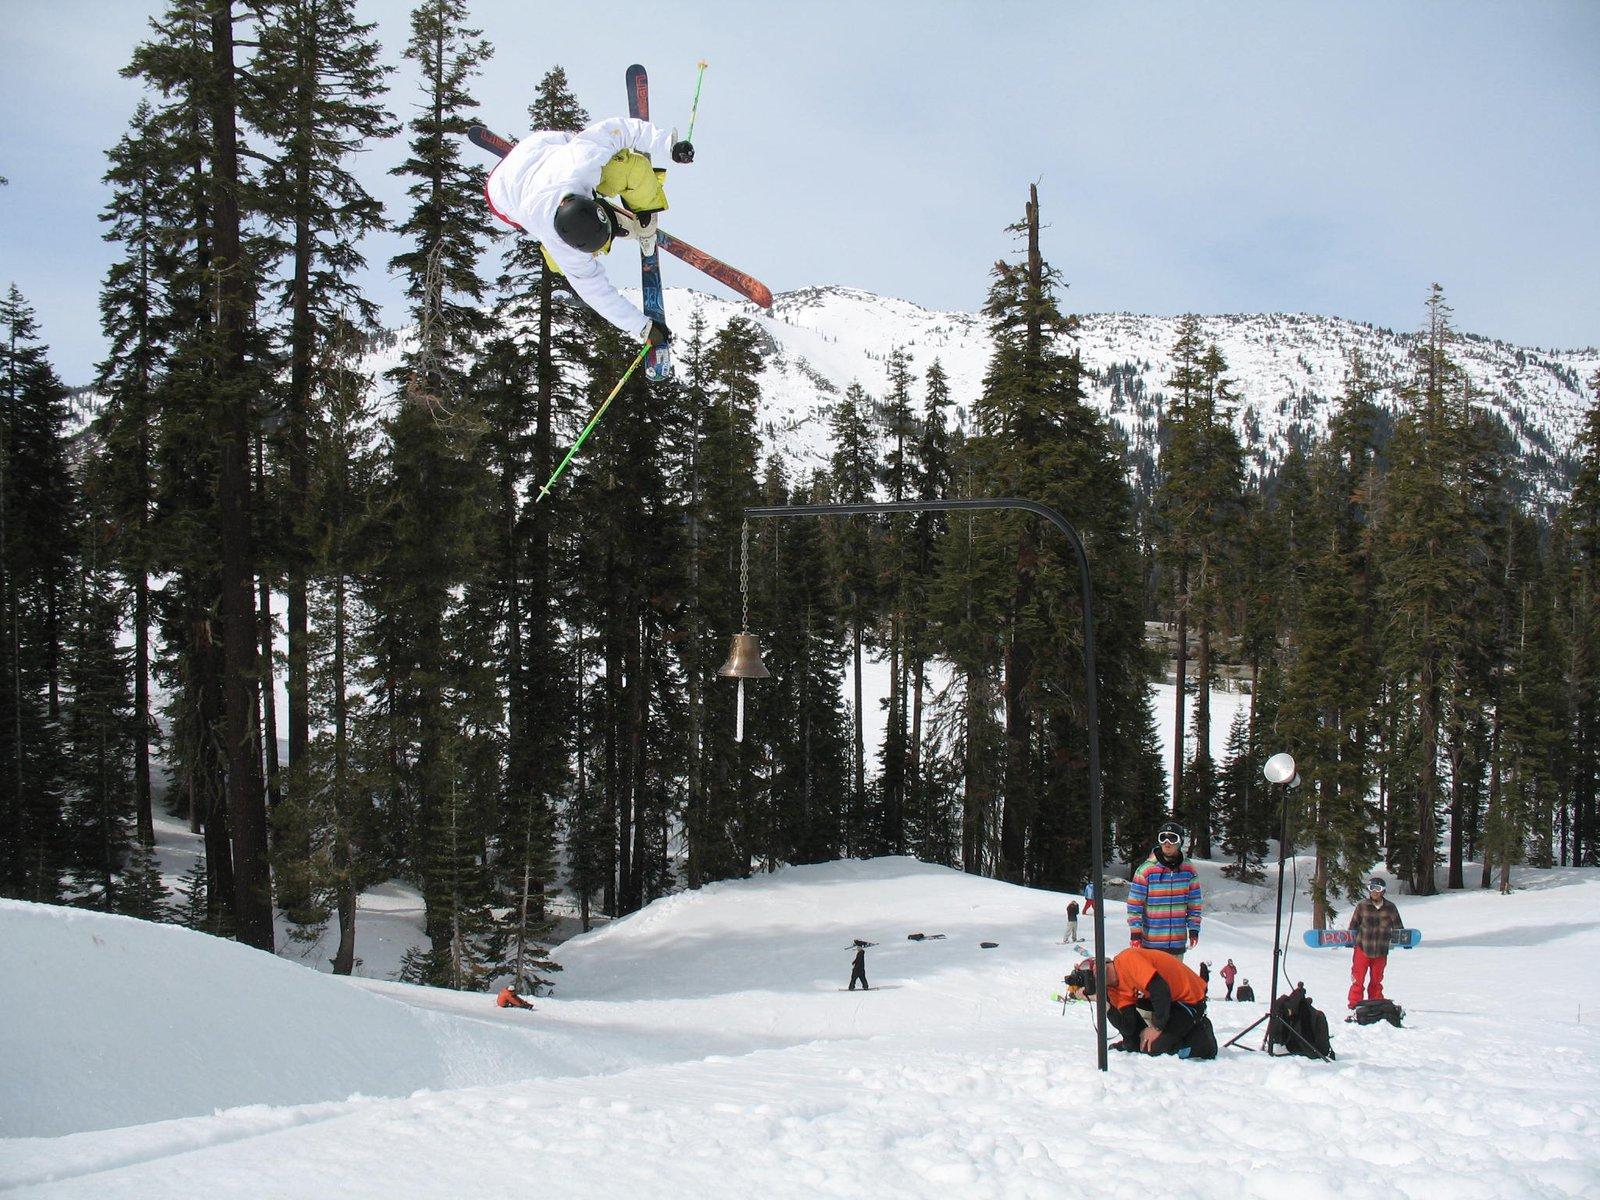 Team skier Colby Albino